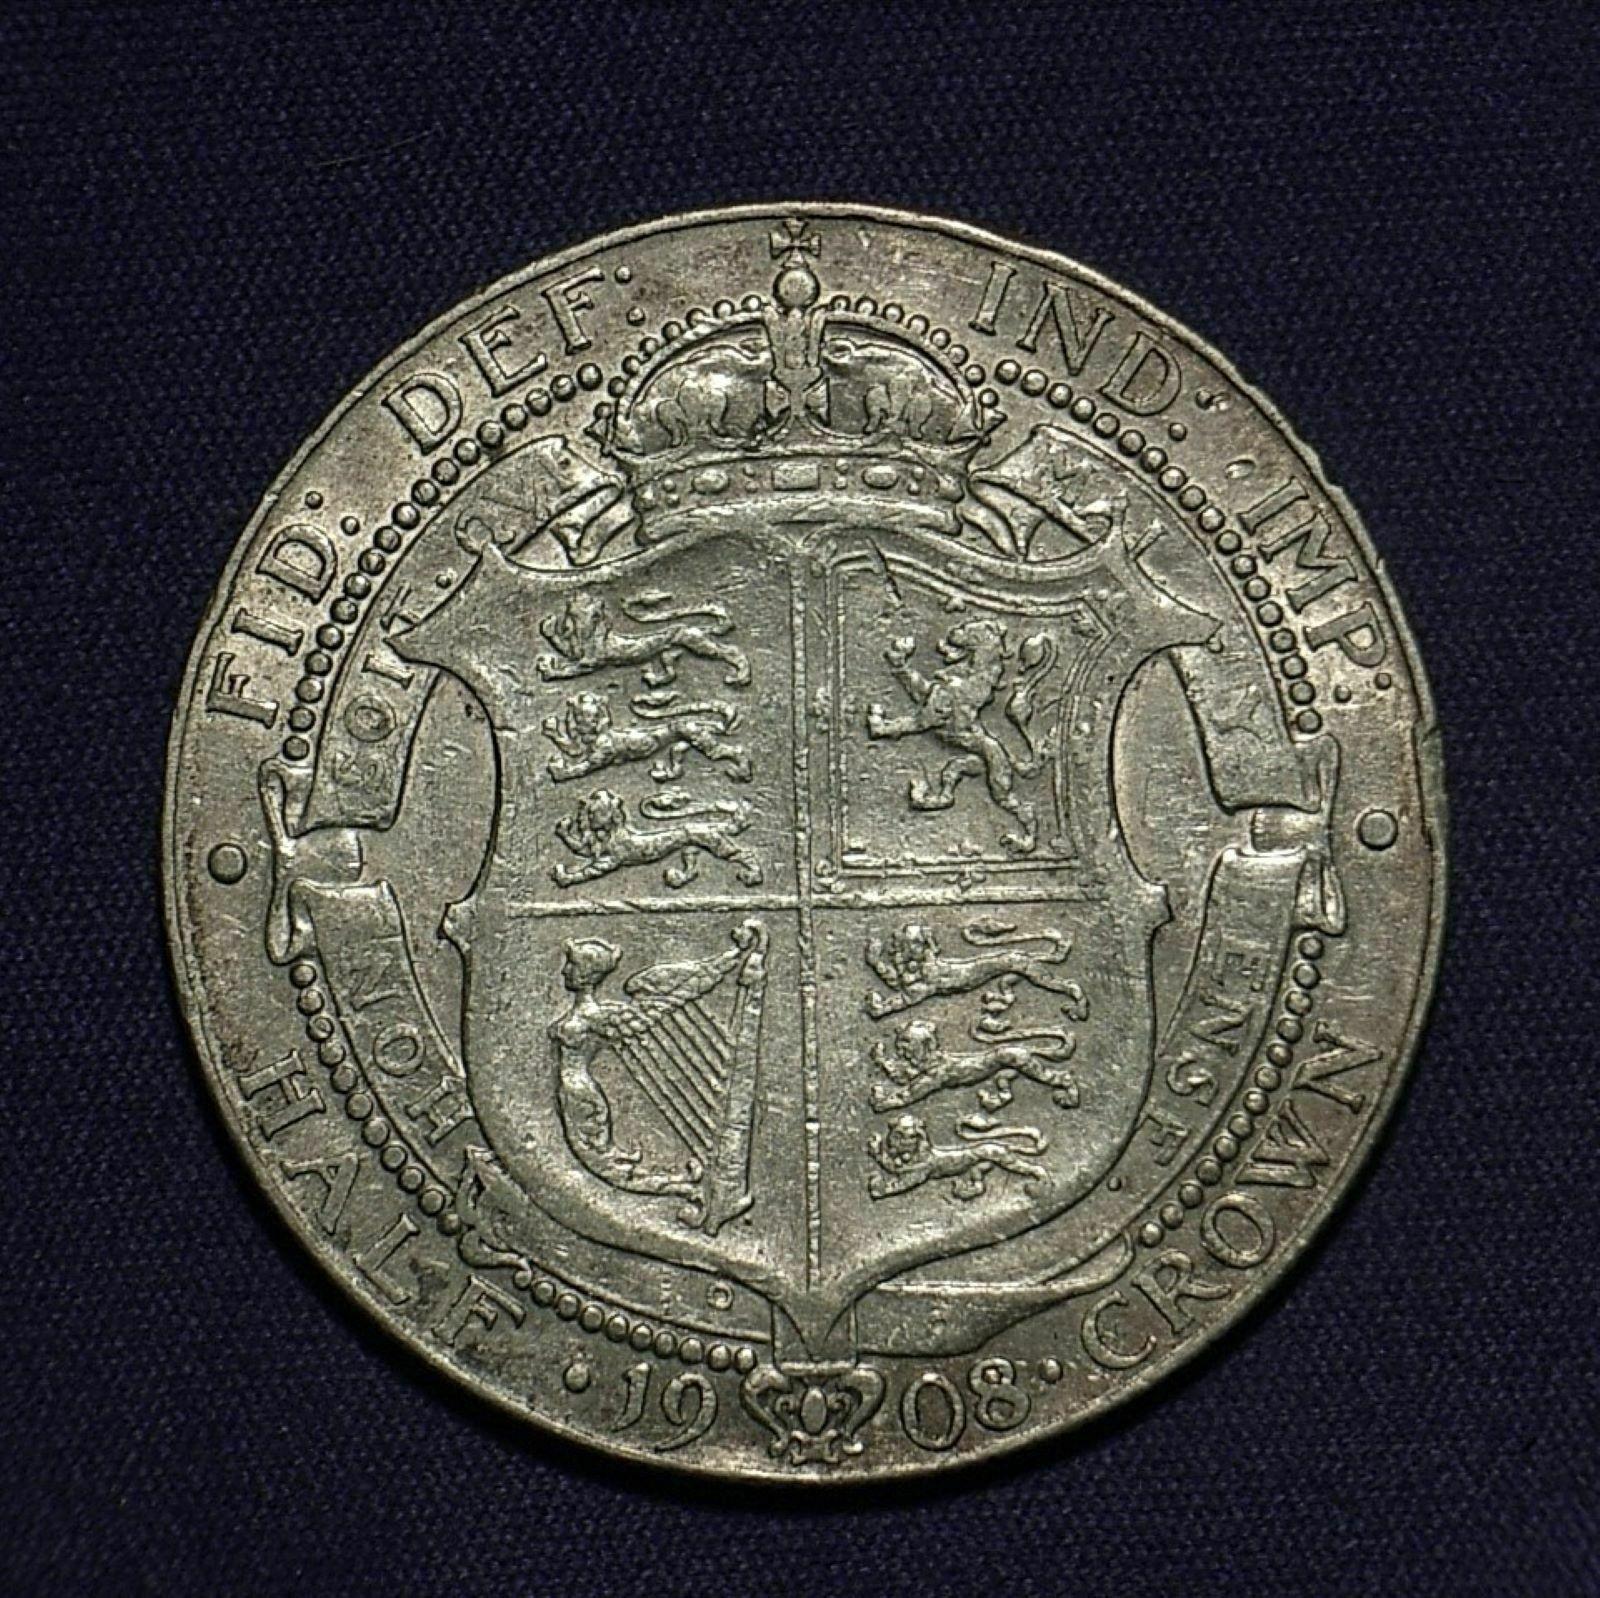 uk-half-crown-1908-rev-1